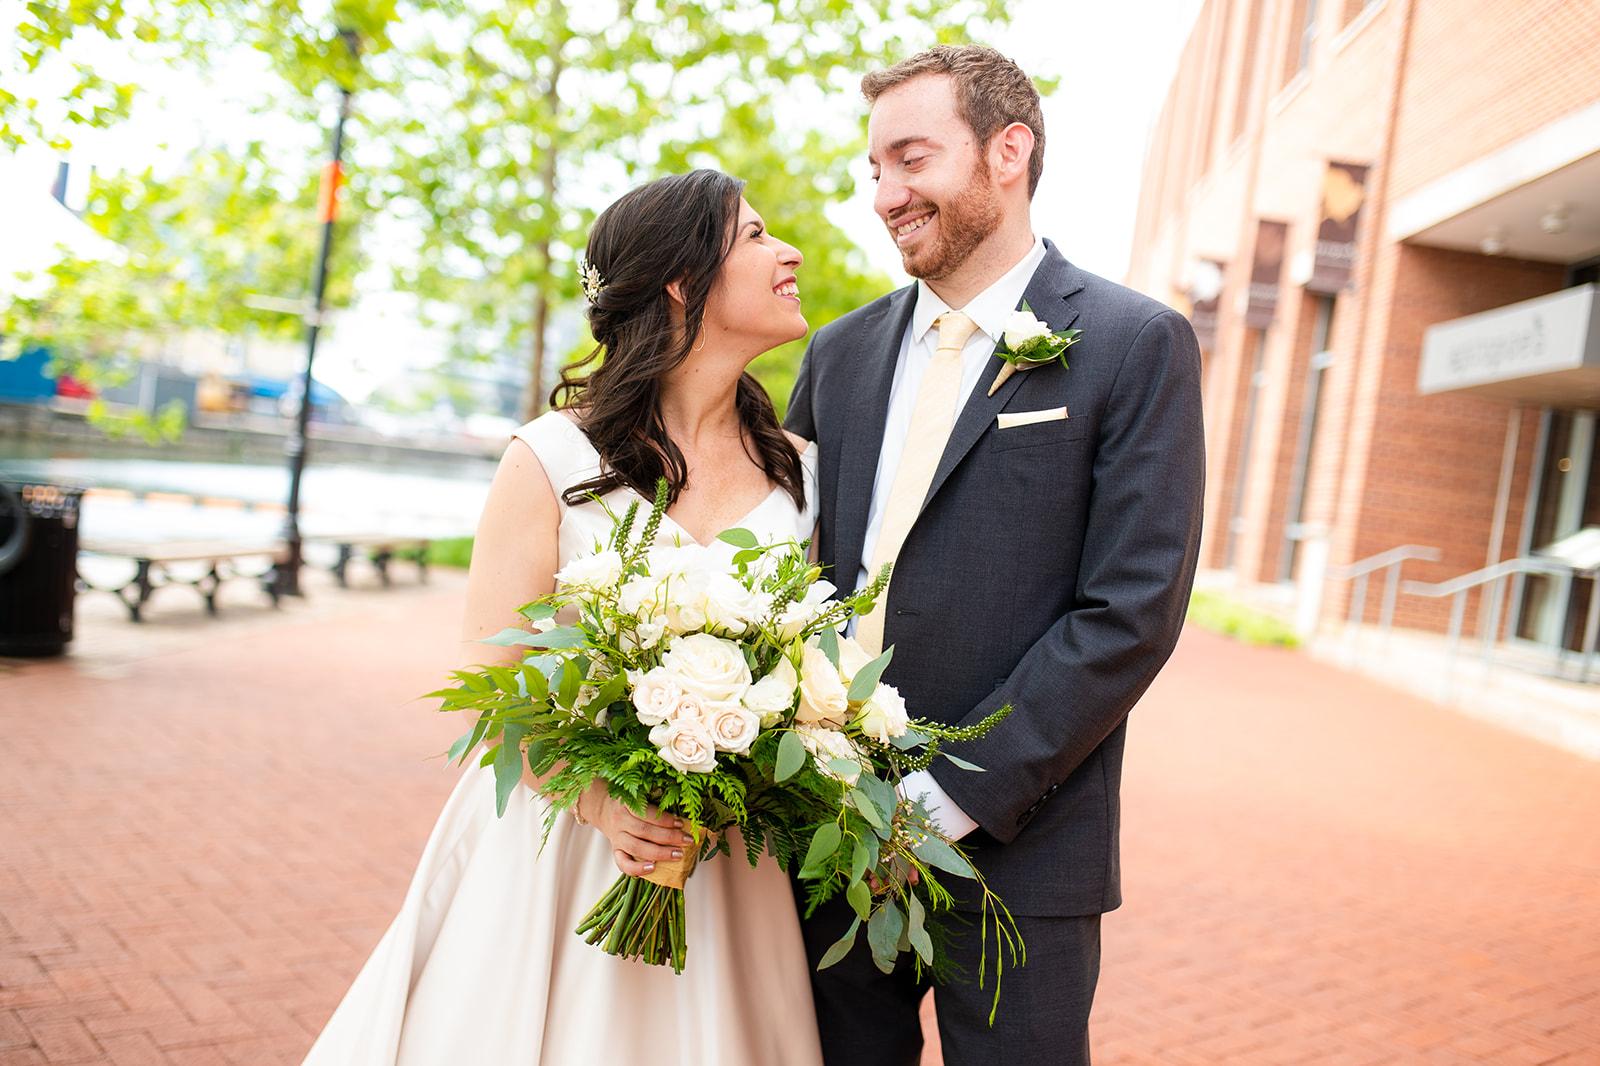 The_best_of_the_best_wedding_photographer_Mantas_Kubilinskas-250.jpg